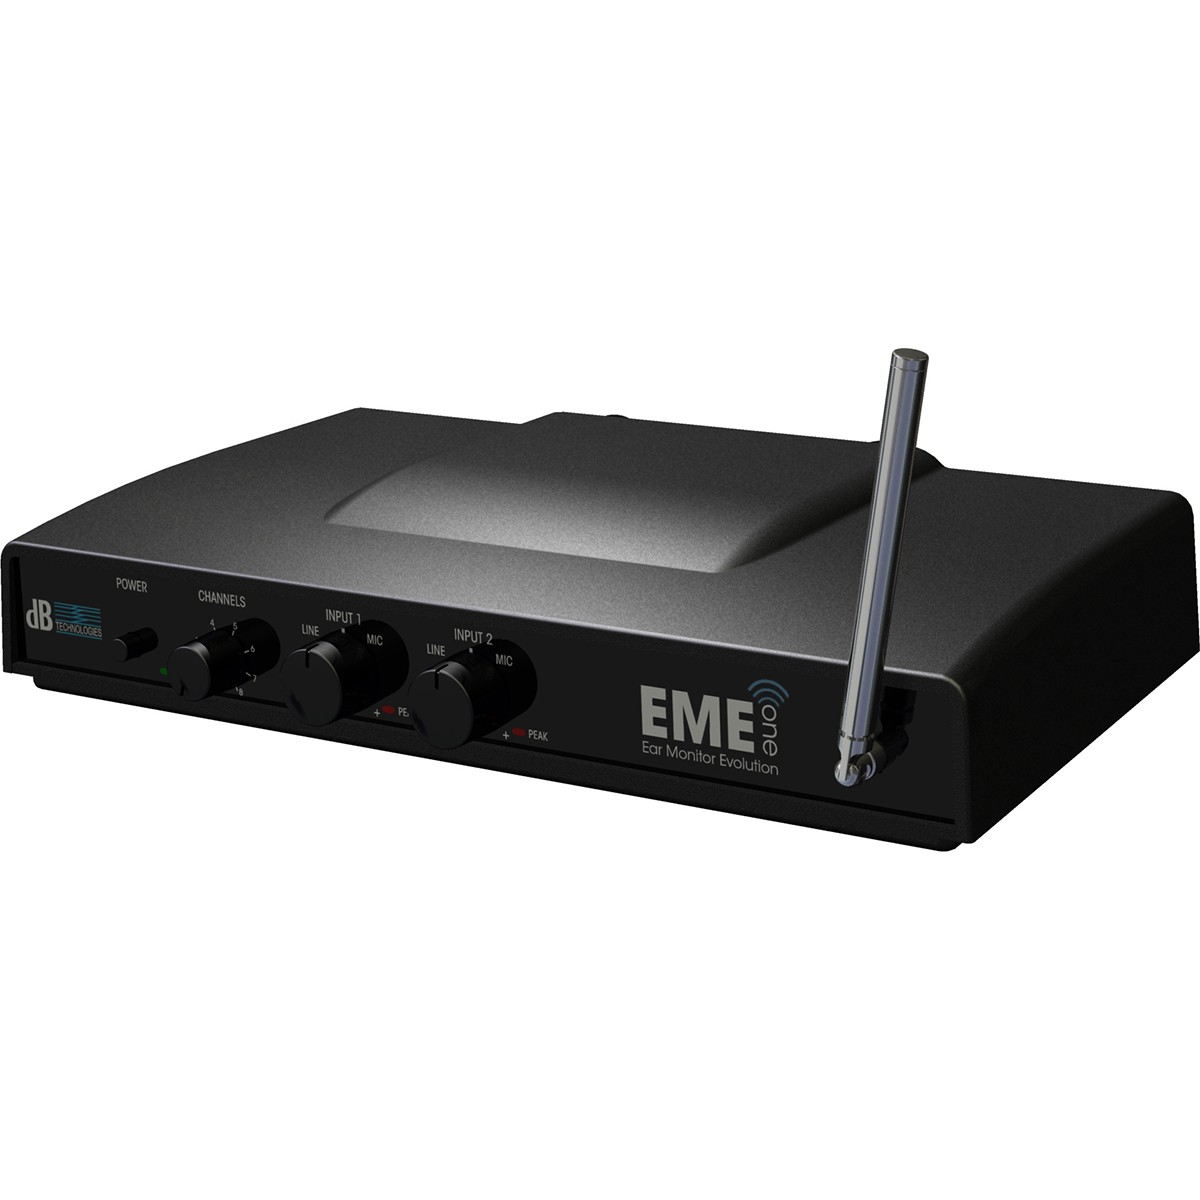 dB Technologies EME ONE, Sistema de Monitoramento, Fone de Ouvido In Ear sem fio, Bivolt